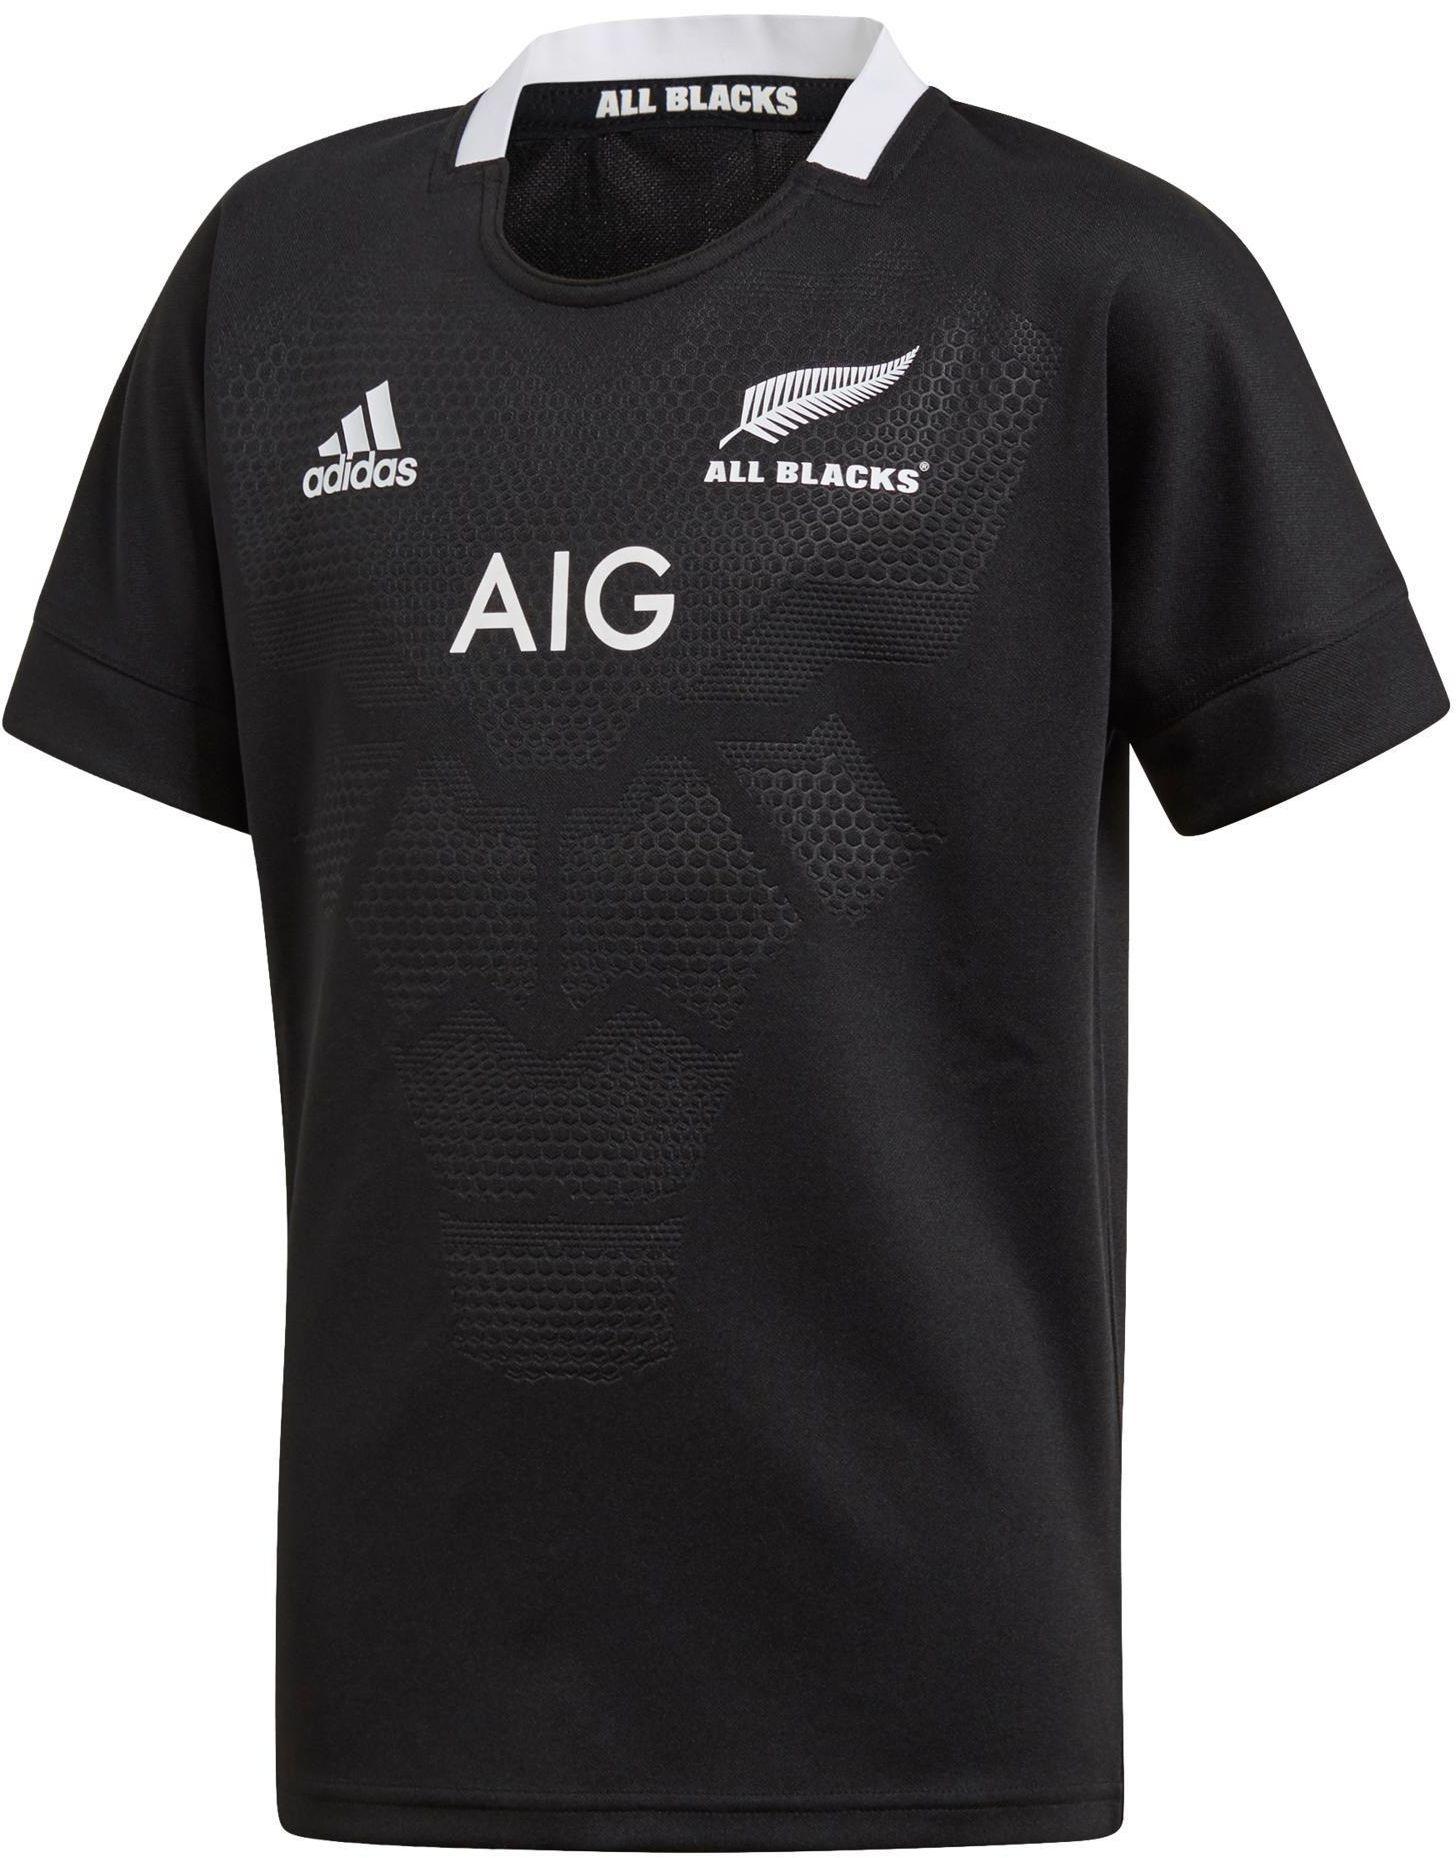 Koszulka do rugby replika All Blacks